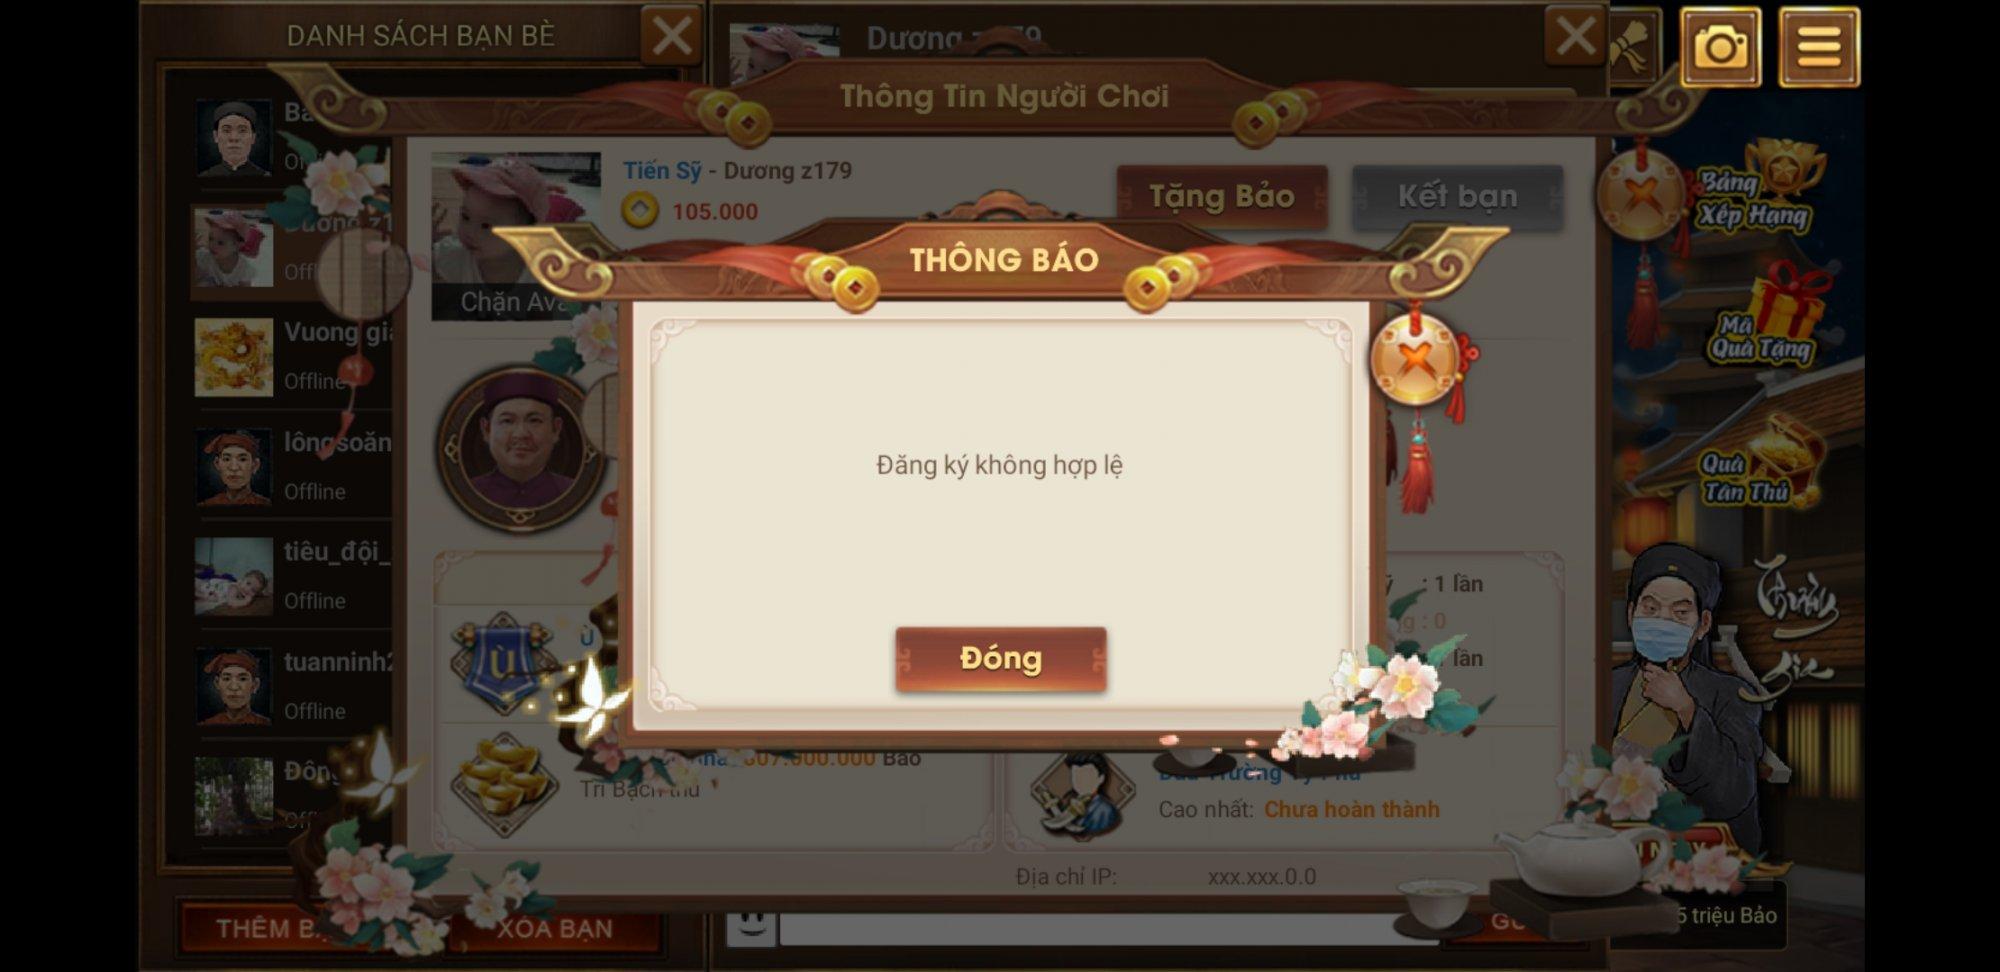 Screenshot_20200507-192712_Chn Sn nh.